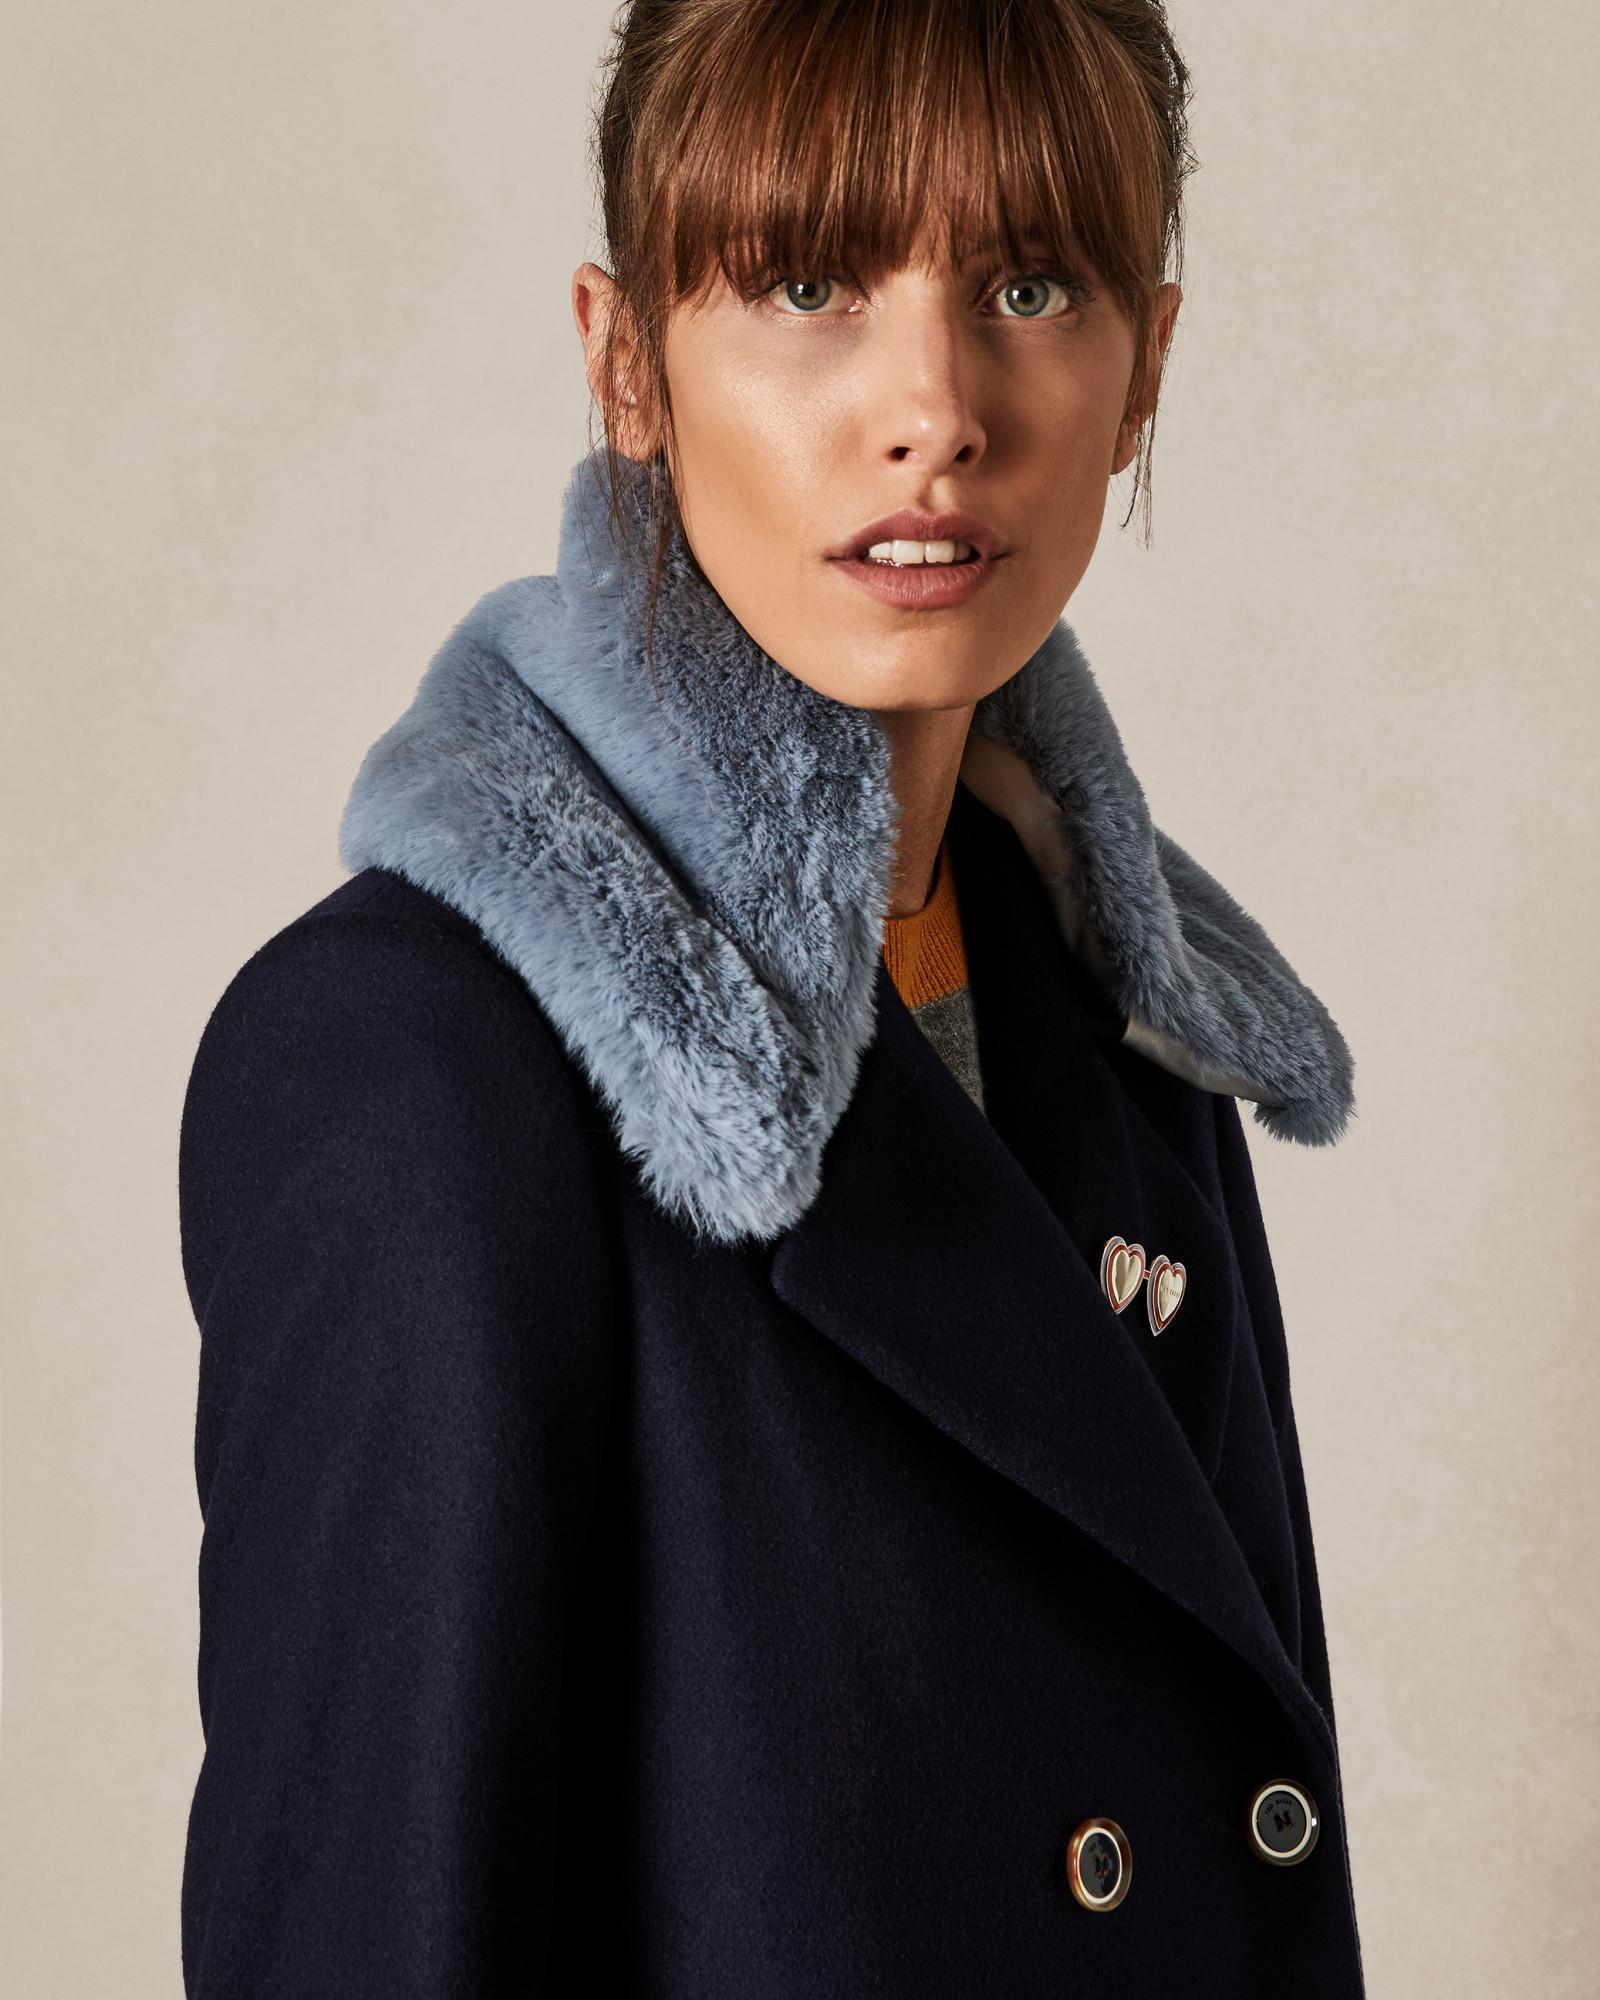 6702b63a43fe9 Ted Baker Faux Fur Collar in Blue - Lyst